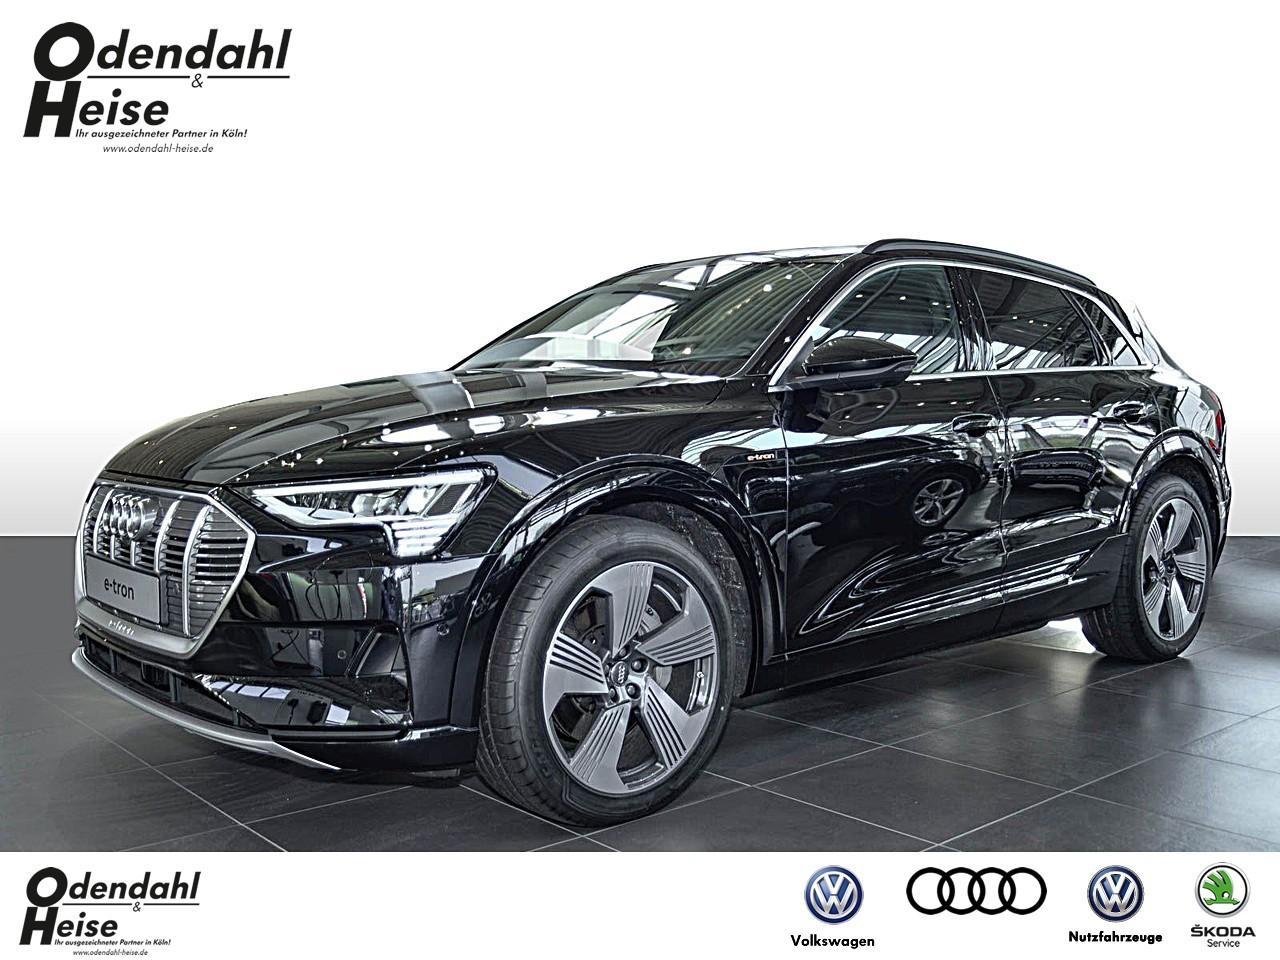 Audi E-tron advanced 55 quattro 265 kW Klima Navi, Jahr 2020, Elektro